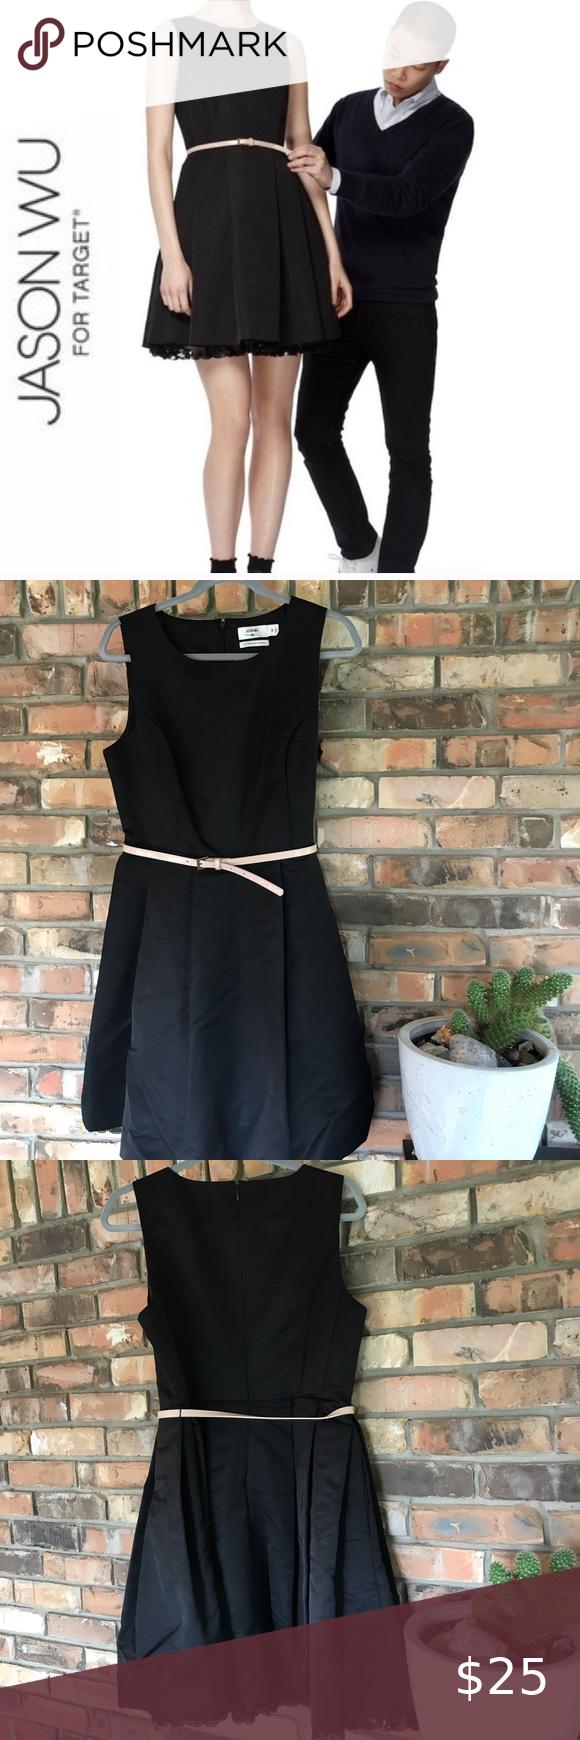 Jason Wu Little Black Dress Little Black Dress Cotton Tank Dress Black Dress [ 1740 x 580 Pixel ]